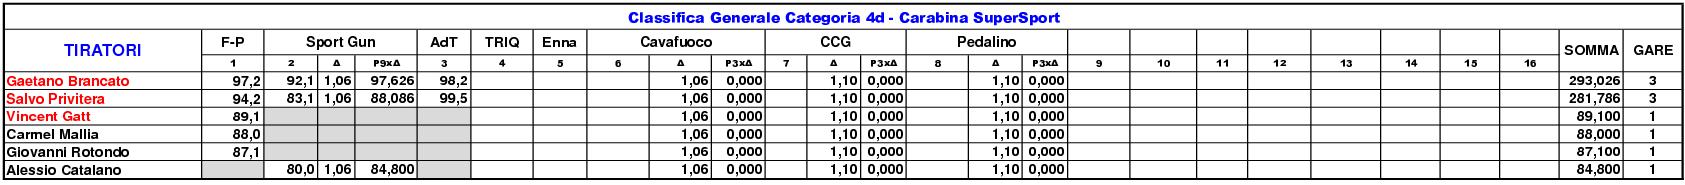 Classifica Generale 202113